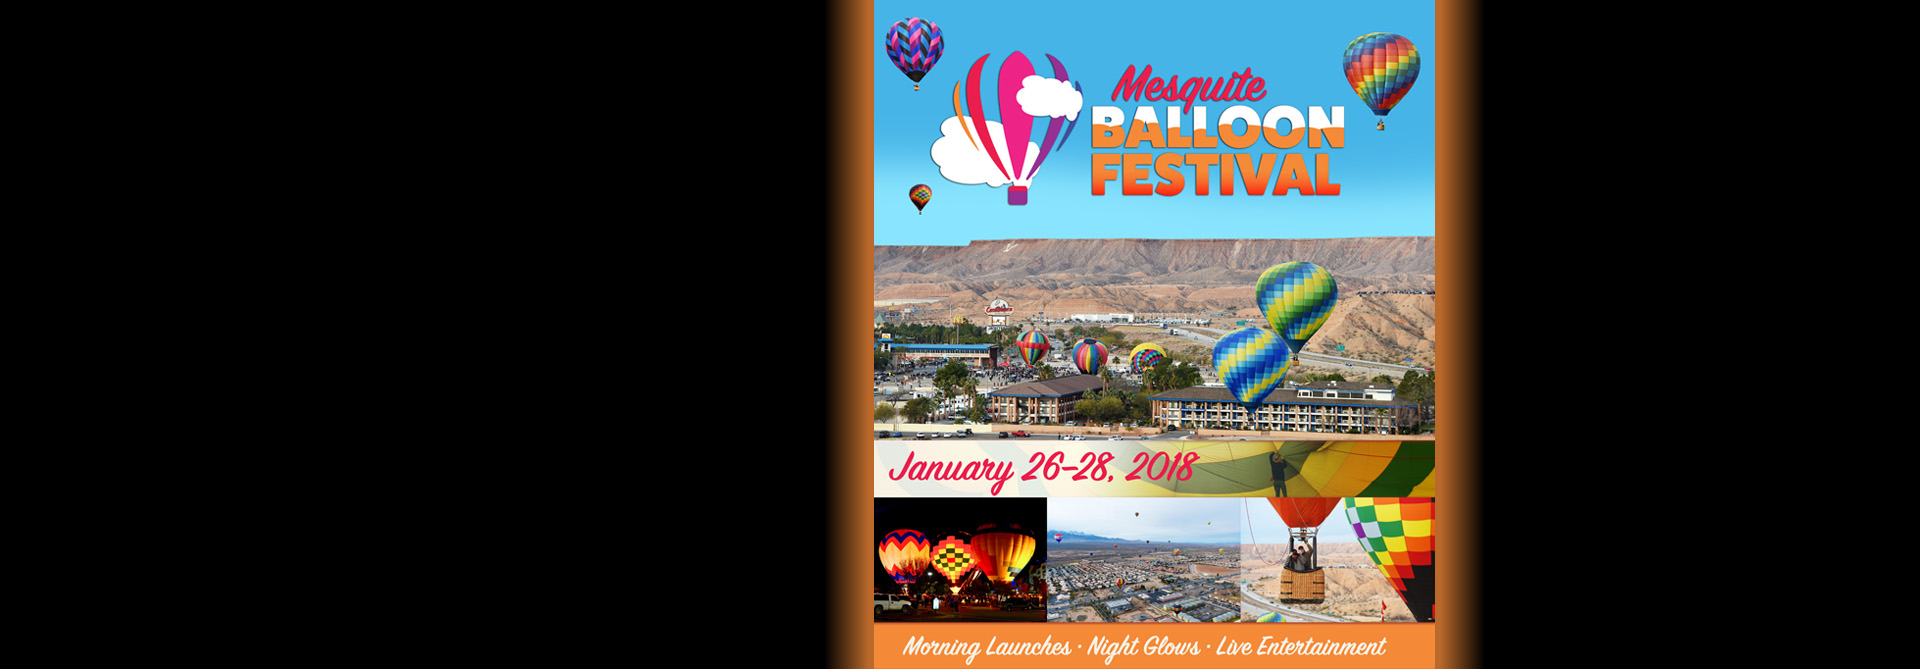 casablanca resort and casino in mesquite nv casablanca resort